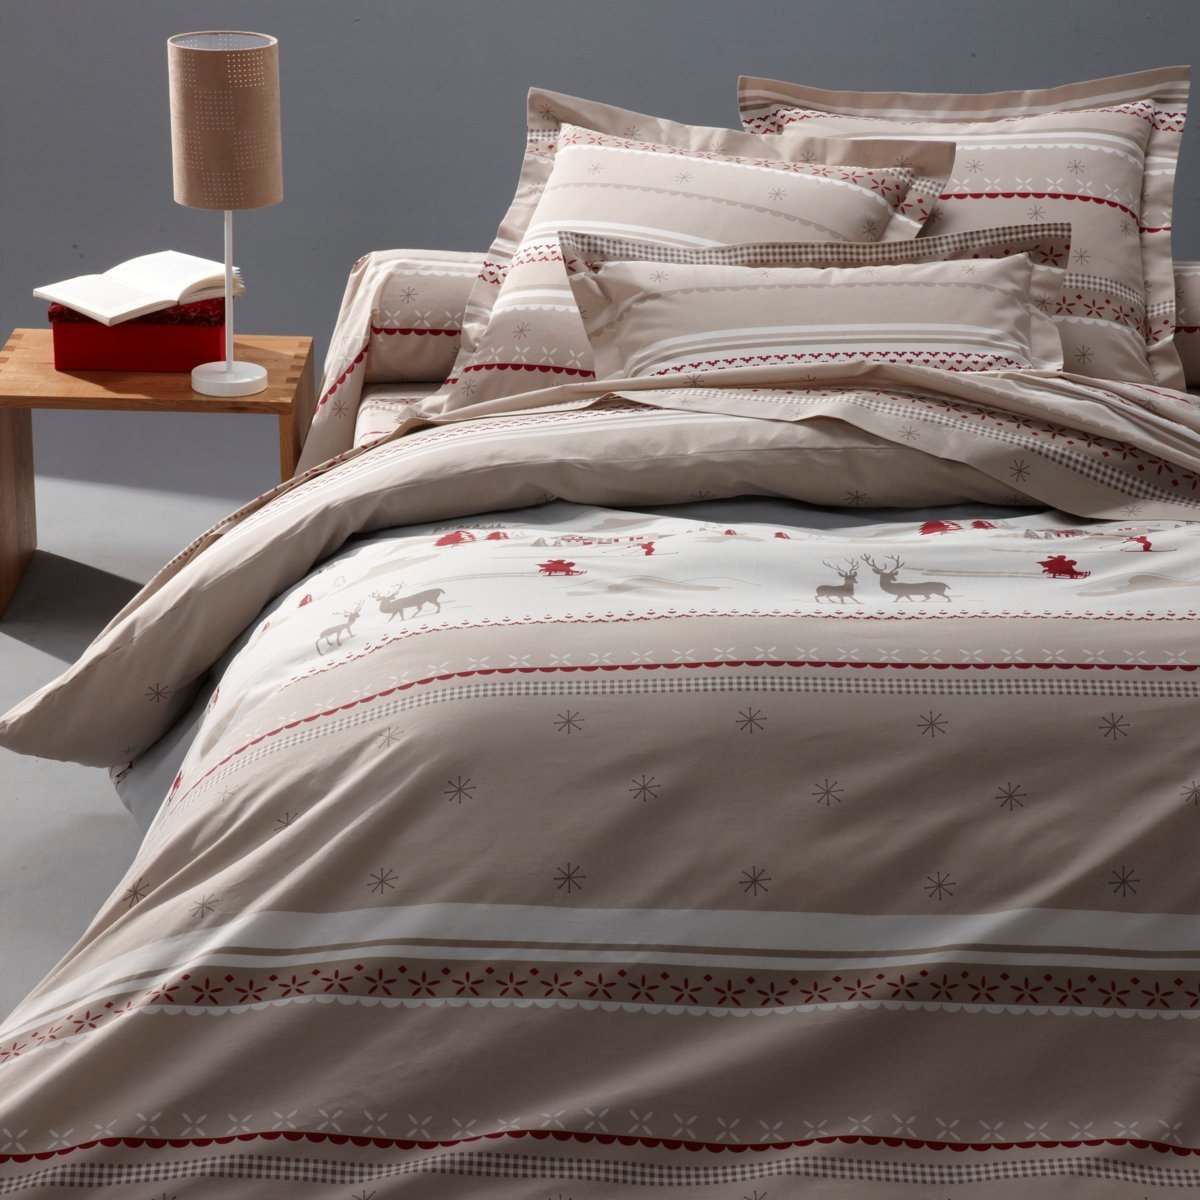 Copripiumino La Redoute.La Redoute Interieurs Tyrol Printed Cotton Duvet Cover Beige Size